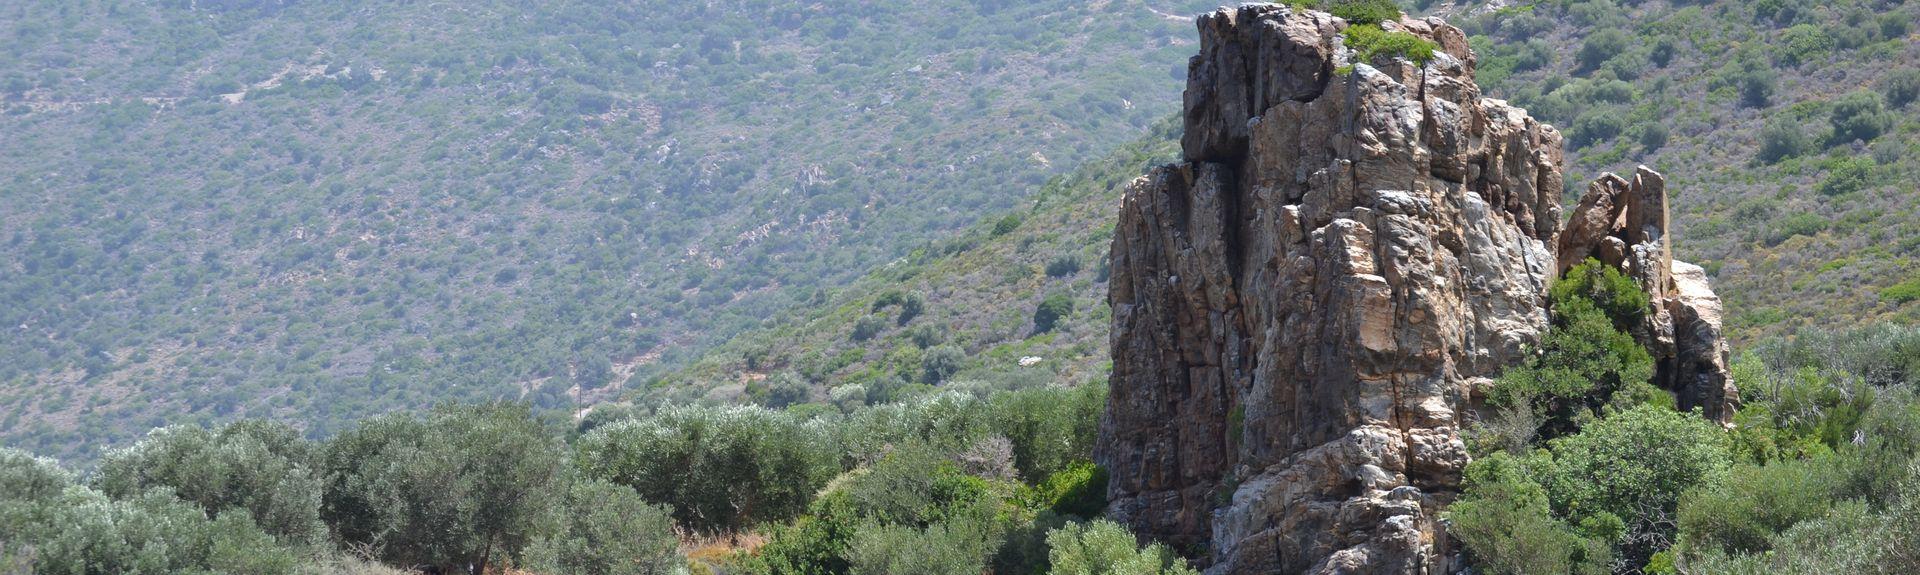 Elafonisin ranta, Kíssamos, Kreeta, Kreikka